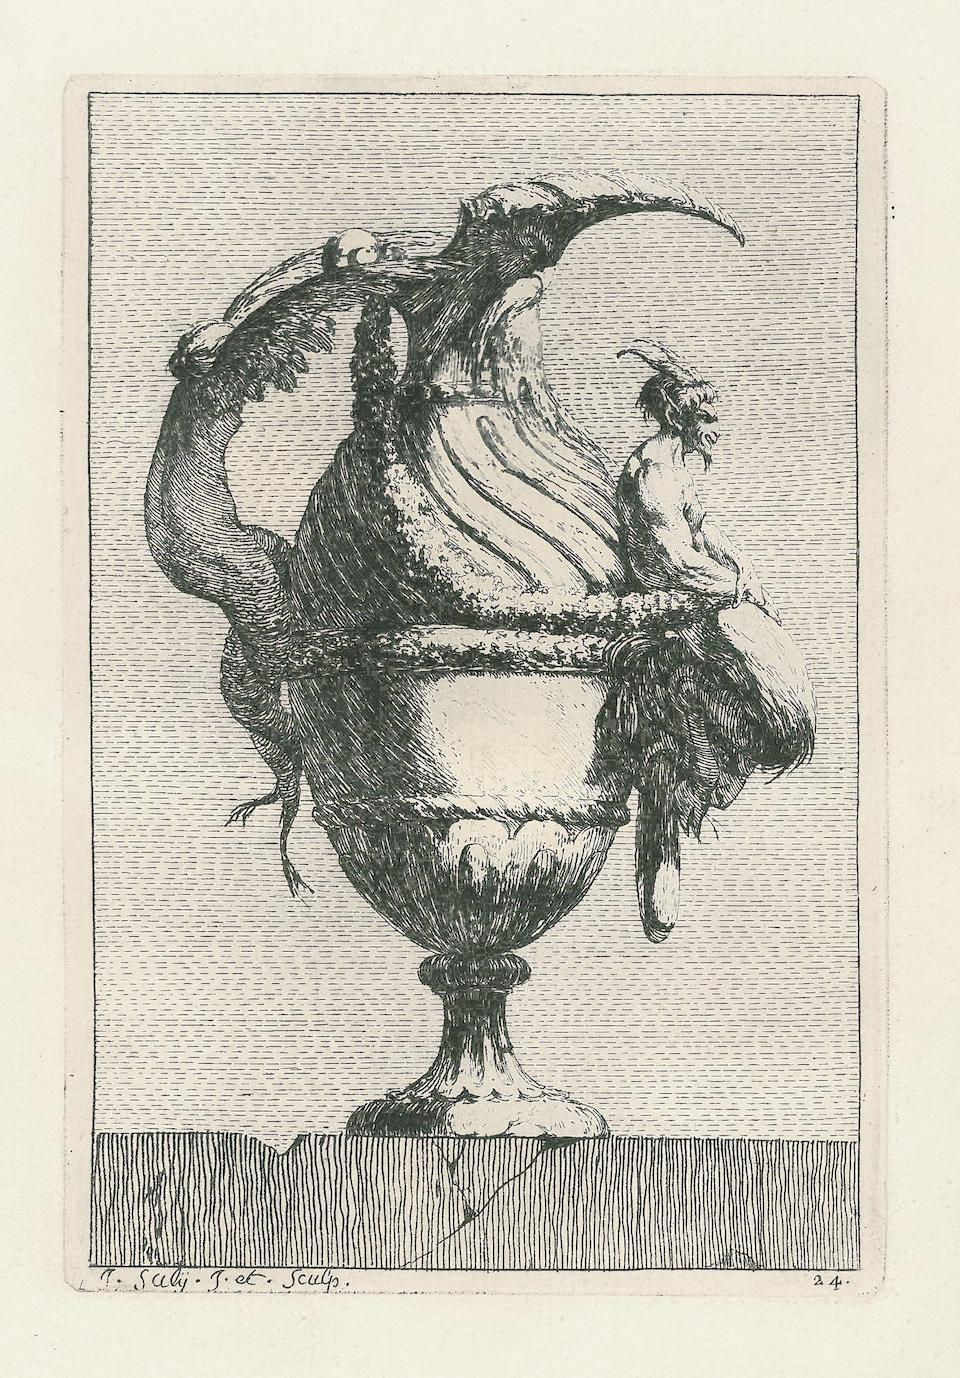 SALY, JACQUES FRANÇOIS. 1717-1776. Vasa a se inventa atq. studii causa delin. et incisa. [Rome]: 1746.